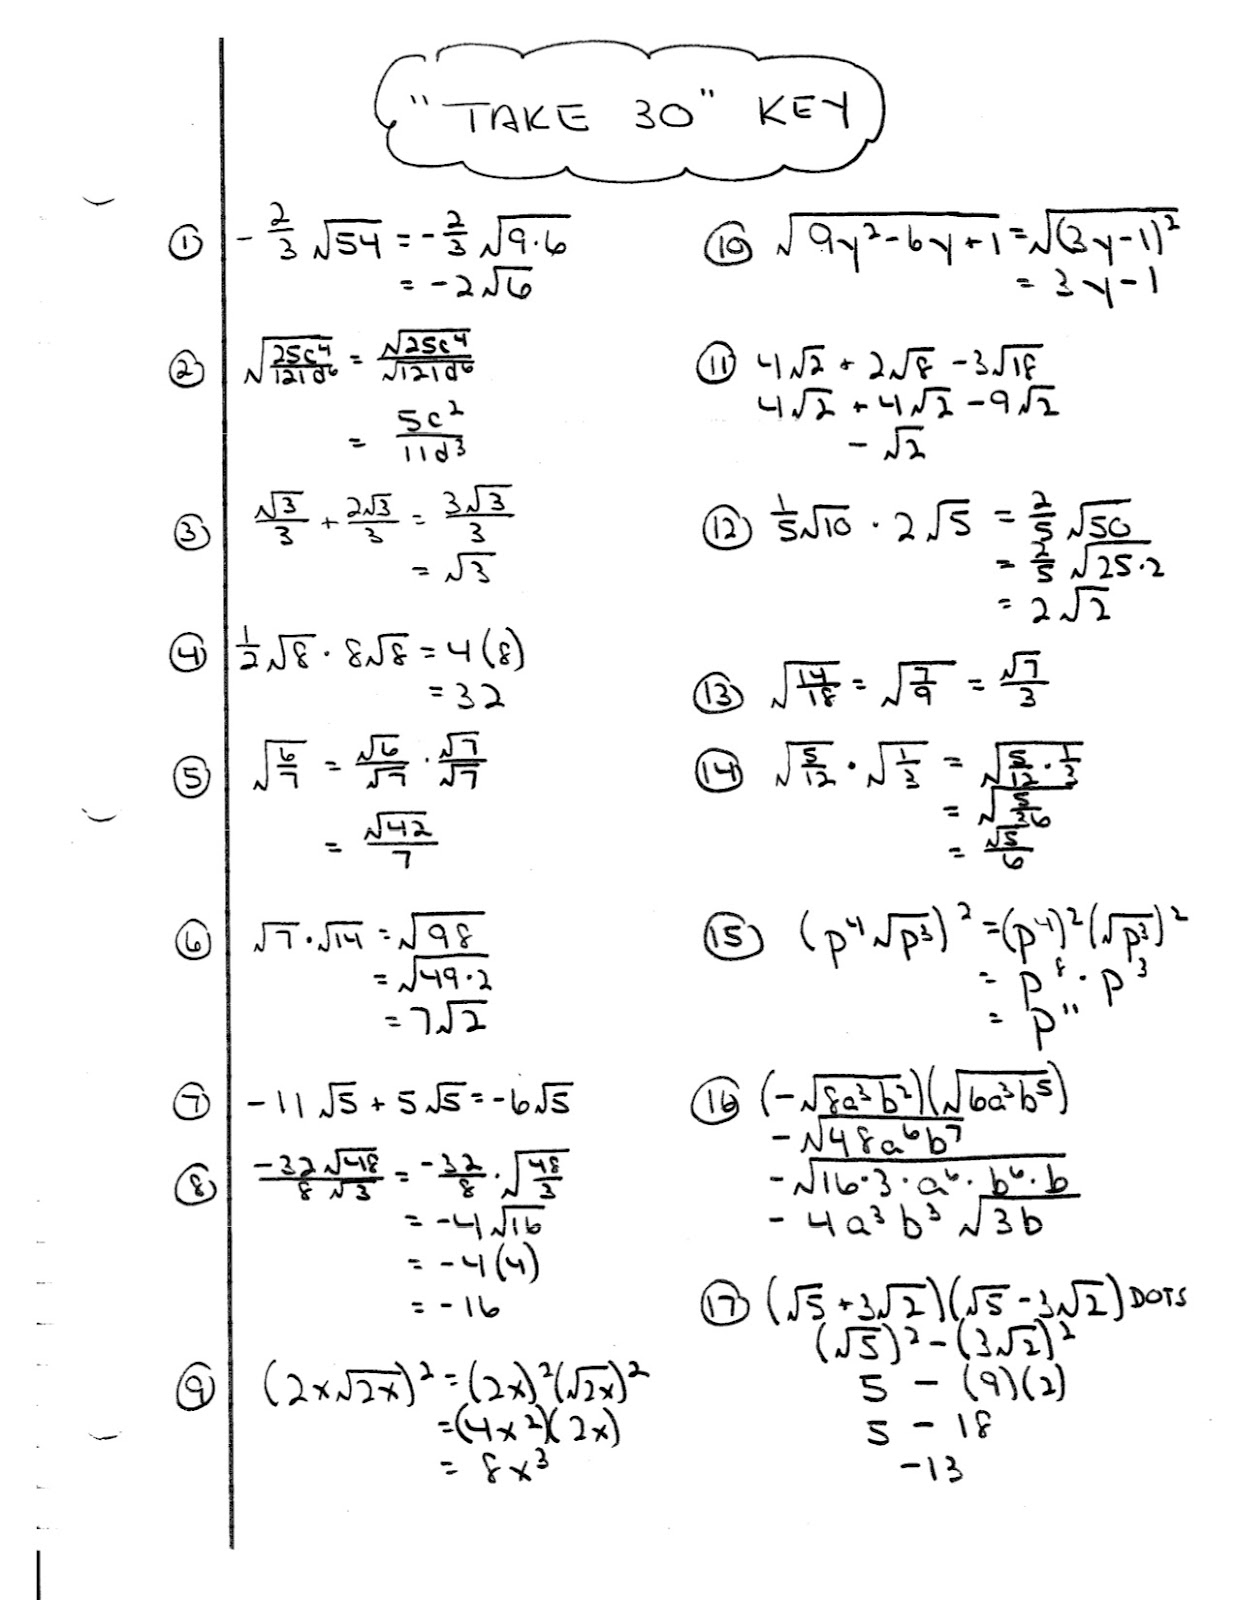 math worksheet : did you hear about math worksheet 115 answers  worksheets for  : Maths Worksheets And Answers